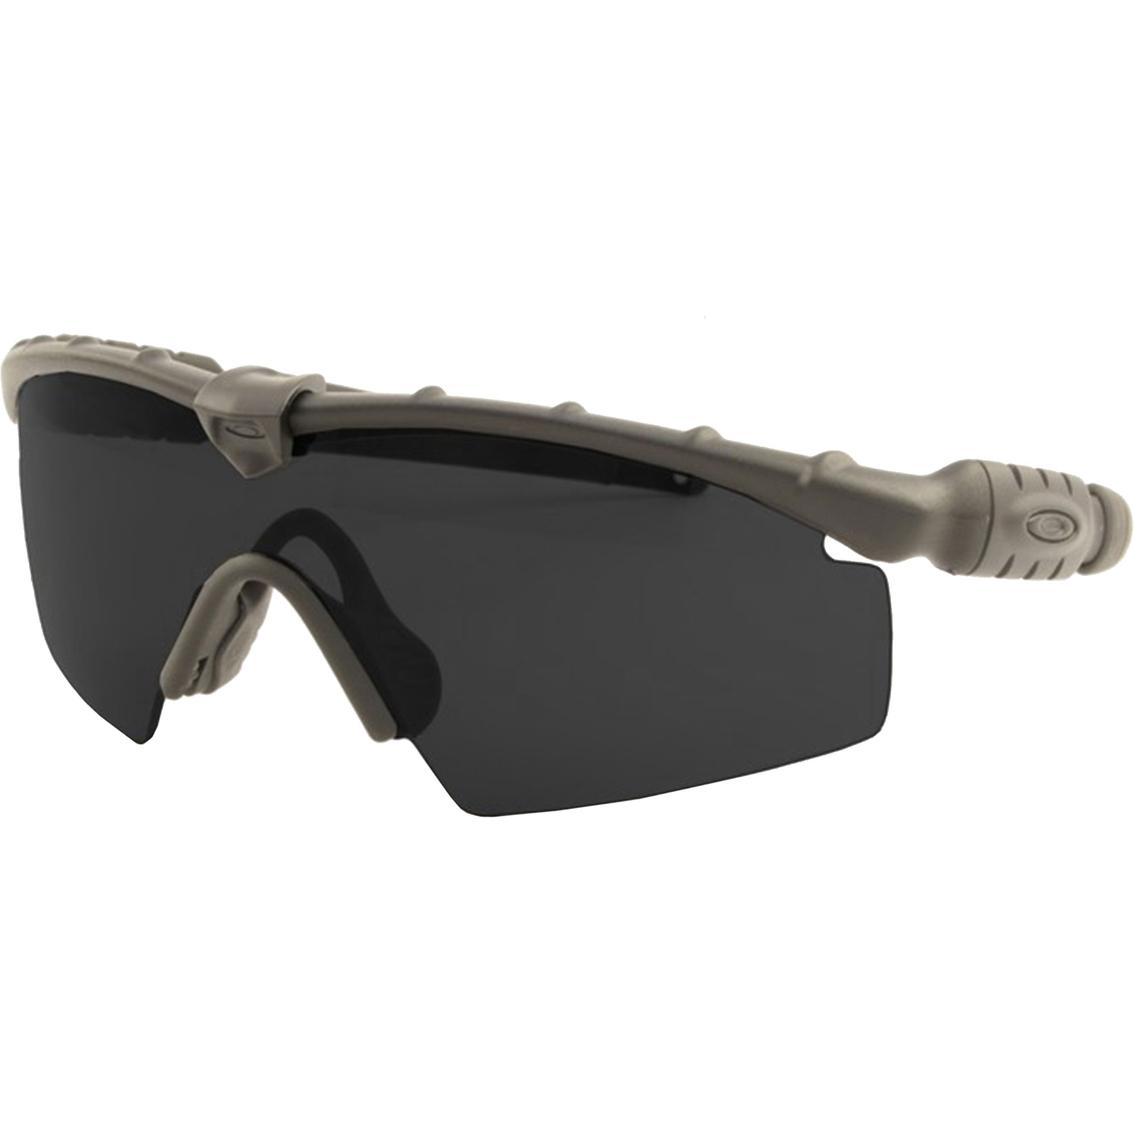 appendere Effettivamente cattivo umore  Oakley Si Ballistic M Frame 2.0 Strike Black/gray | Tactical | Clothing &  Accessories | Shop The Exchange